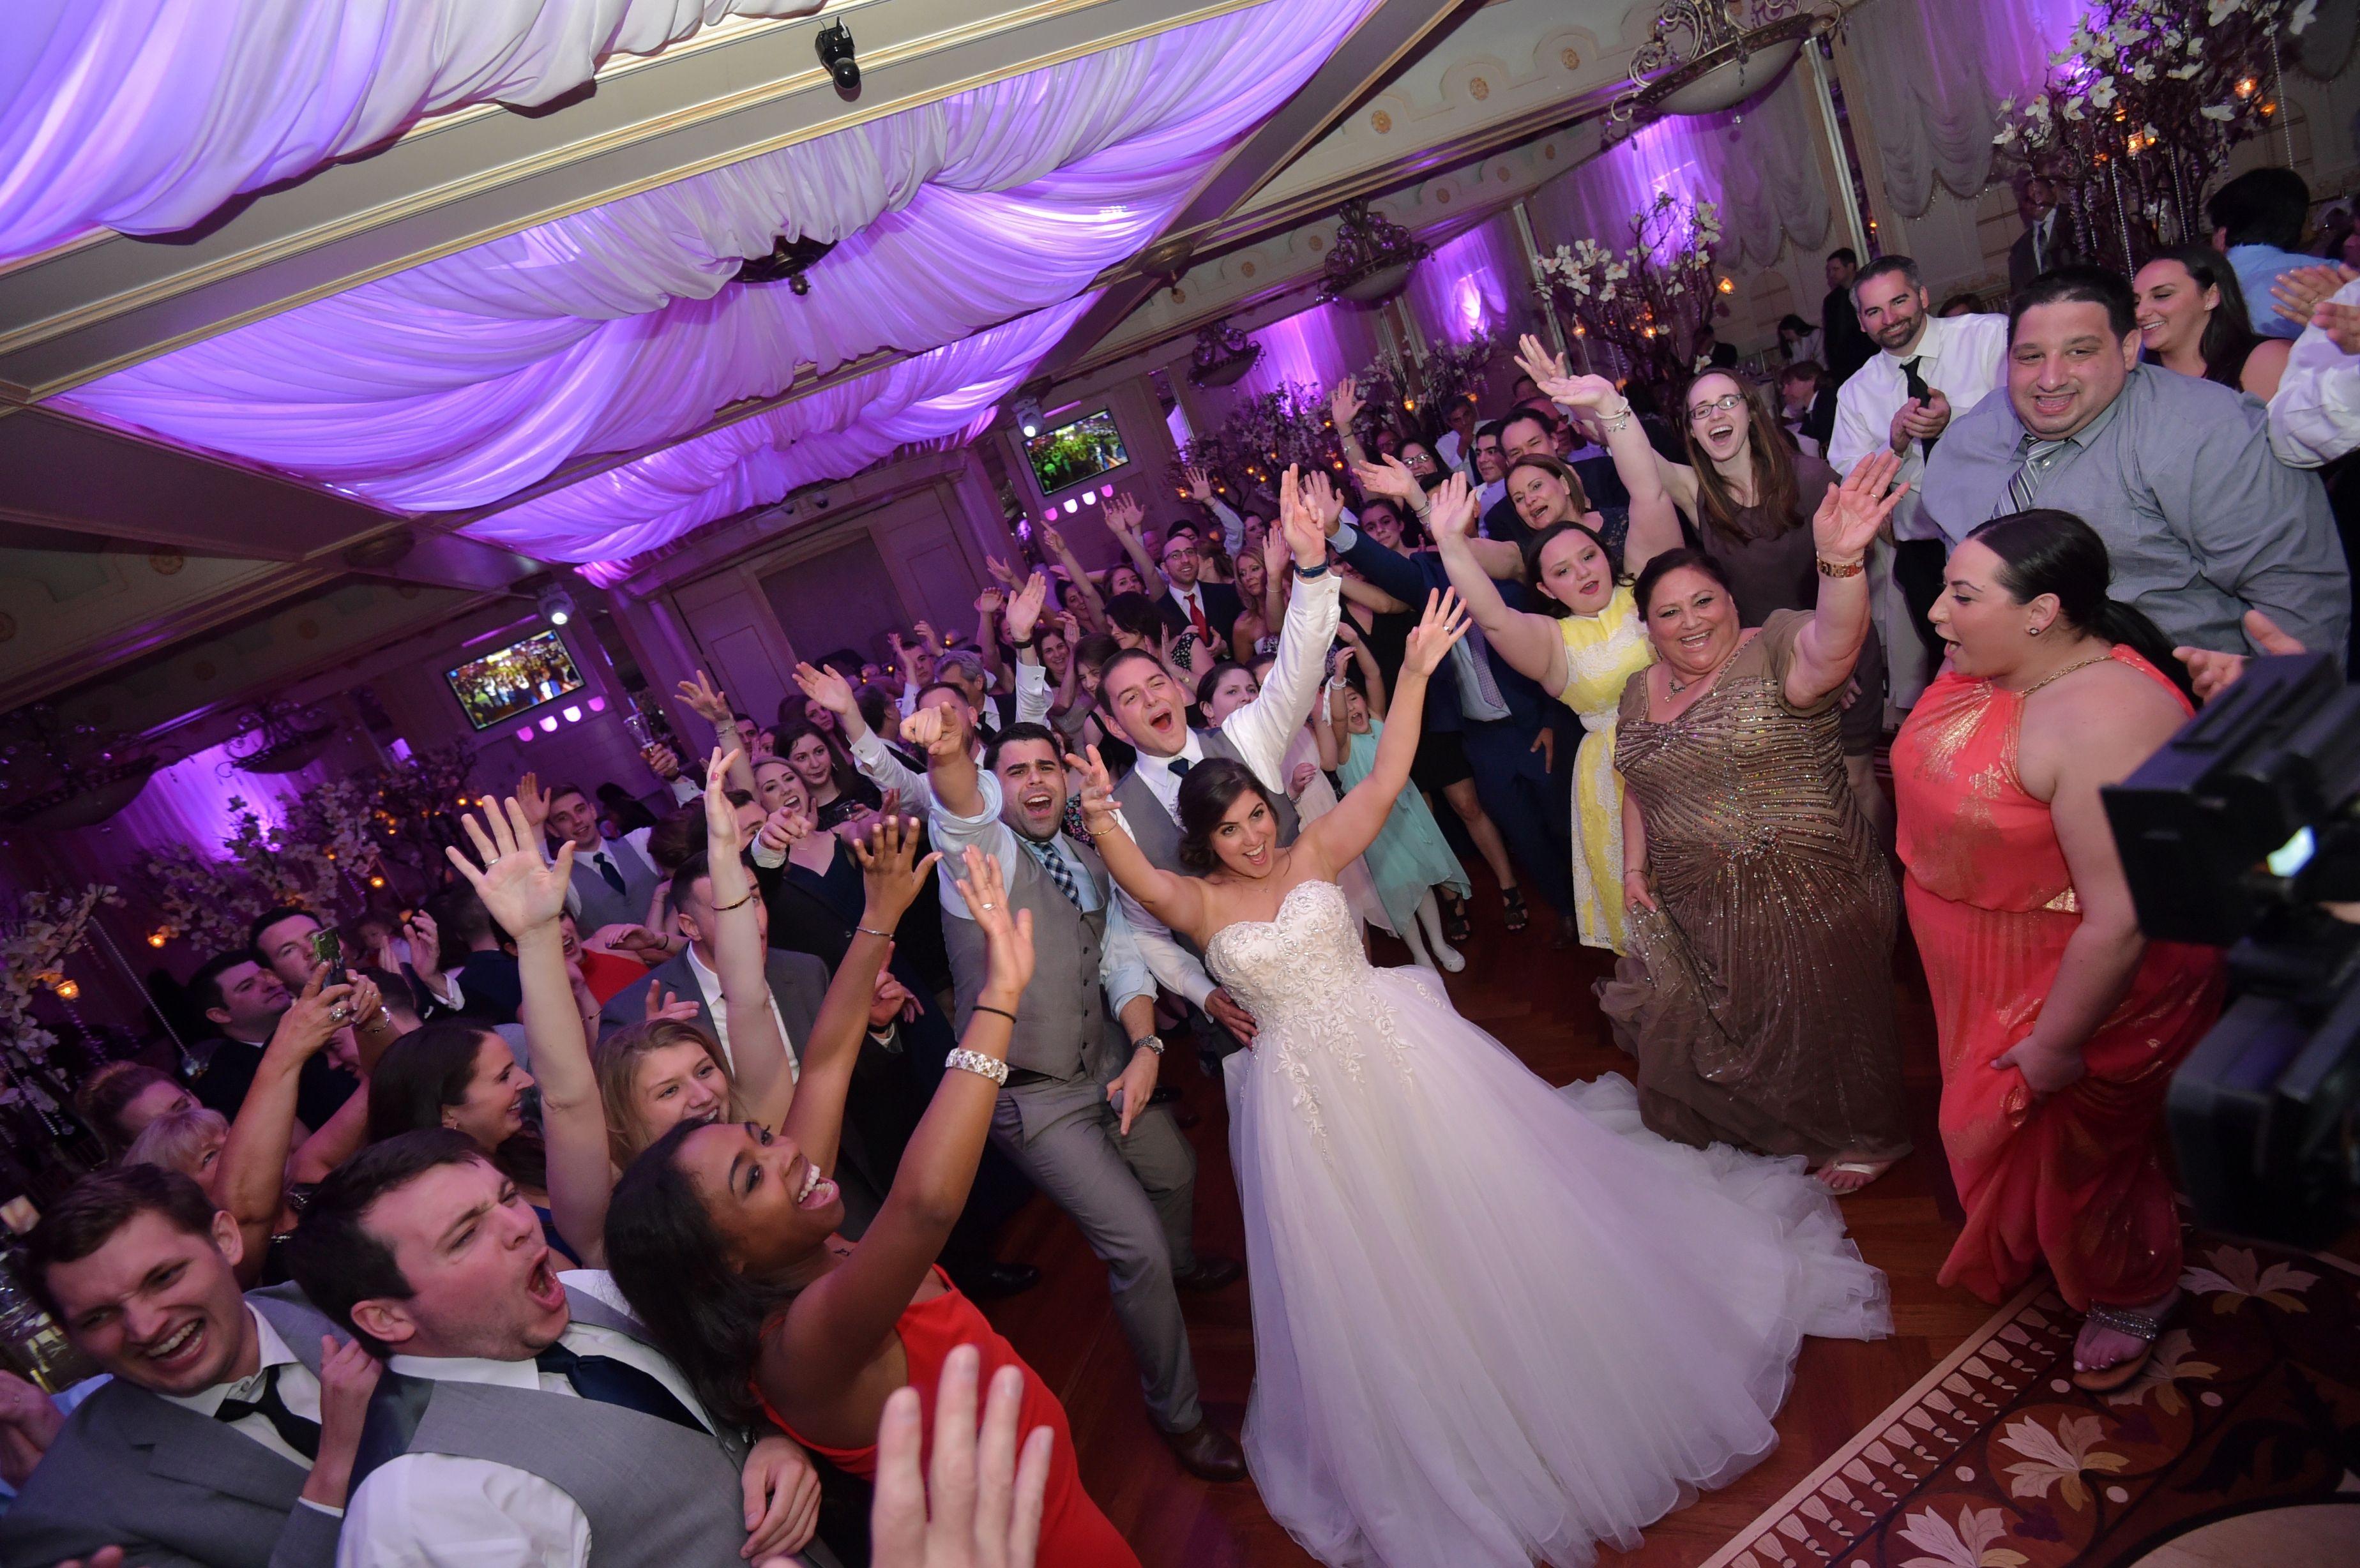 See More Wedding Djs Long Island Photos From Genesis Events On Liwedddings Event Wedding Blog Wedding